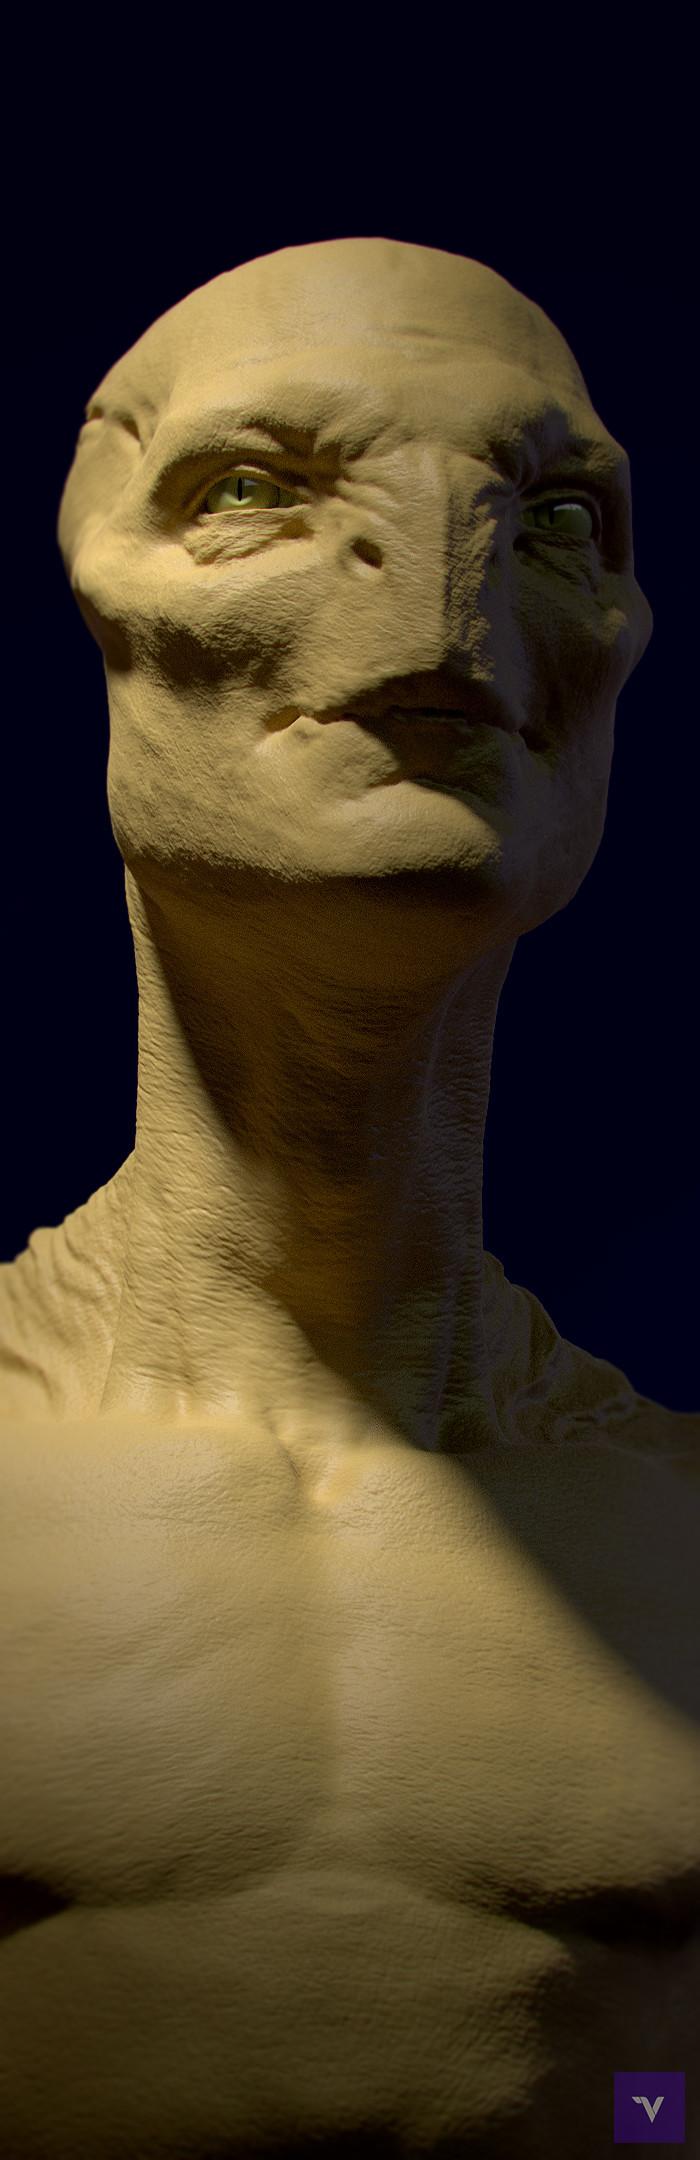 verttigo-cg-verttigocg-alien